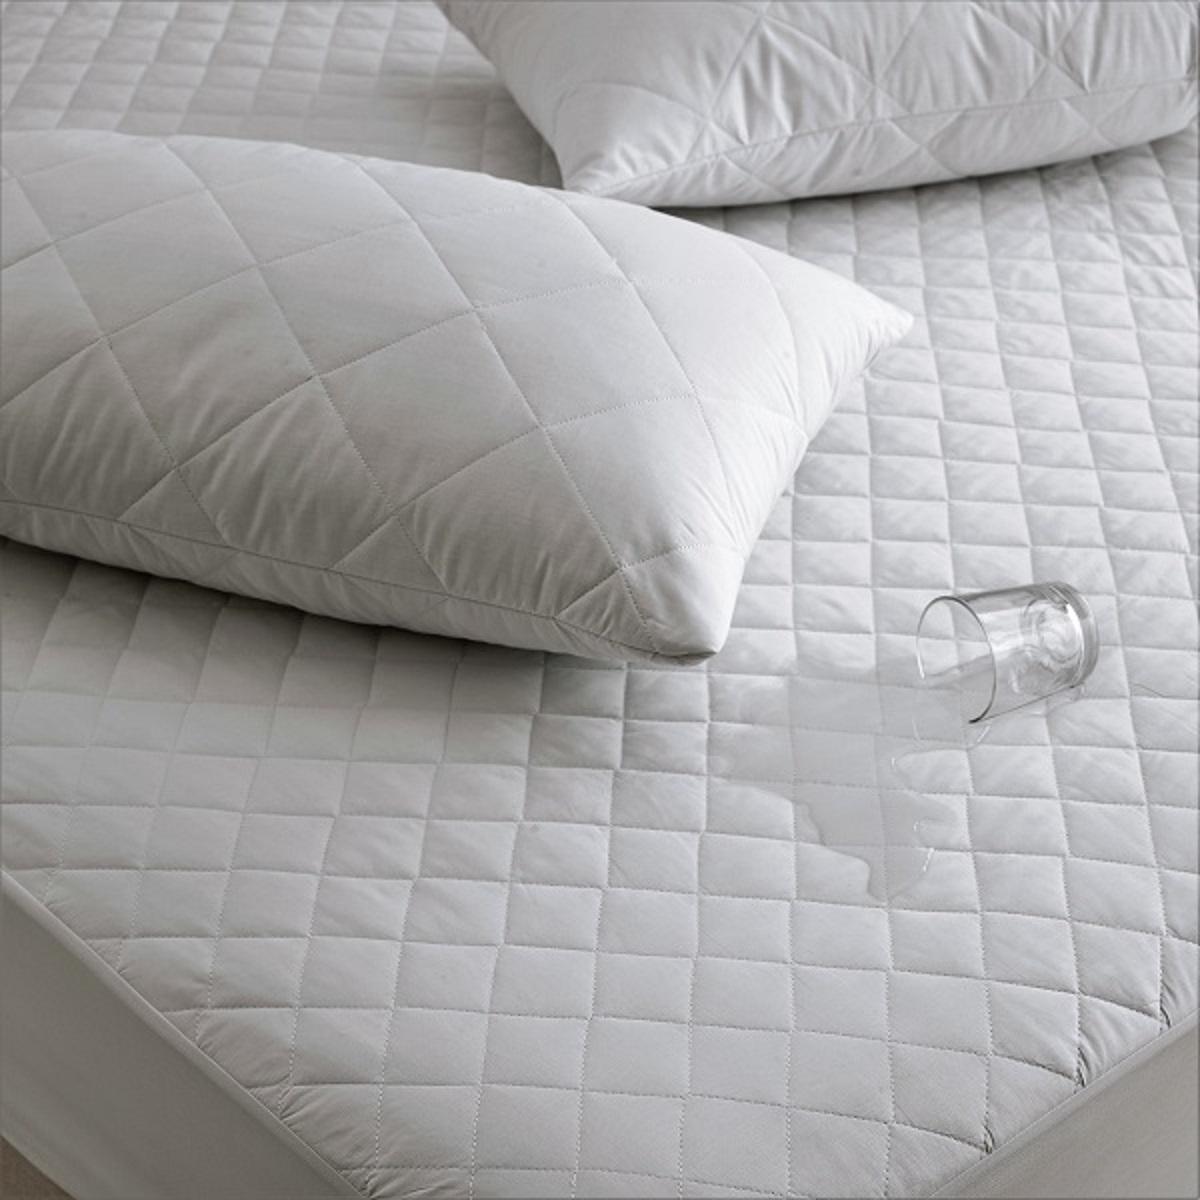 waterproof_mattress_protectors-_1200.jpg